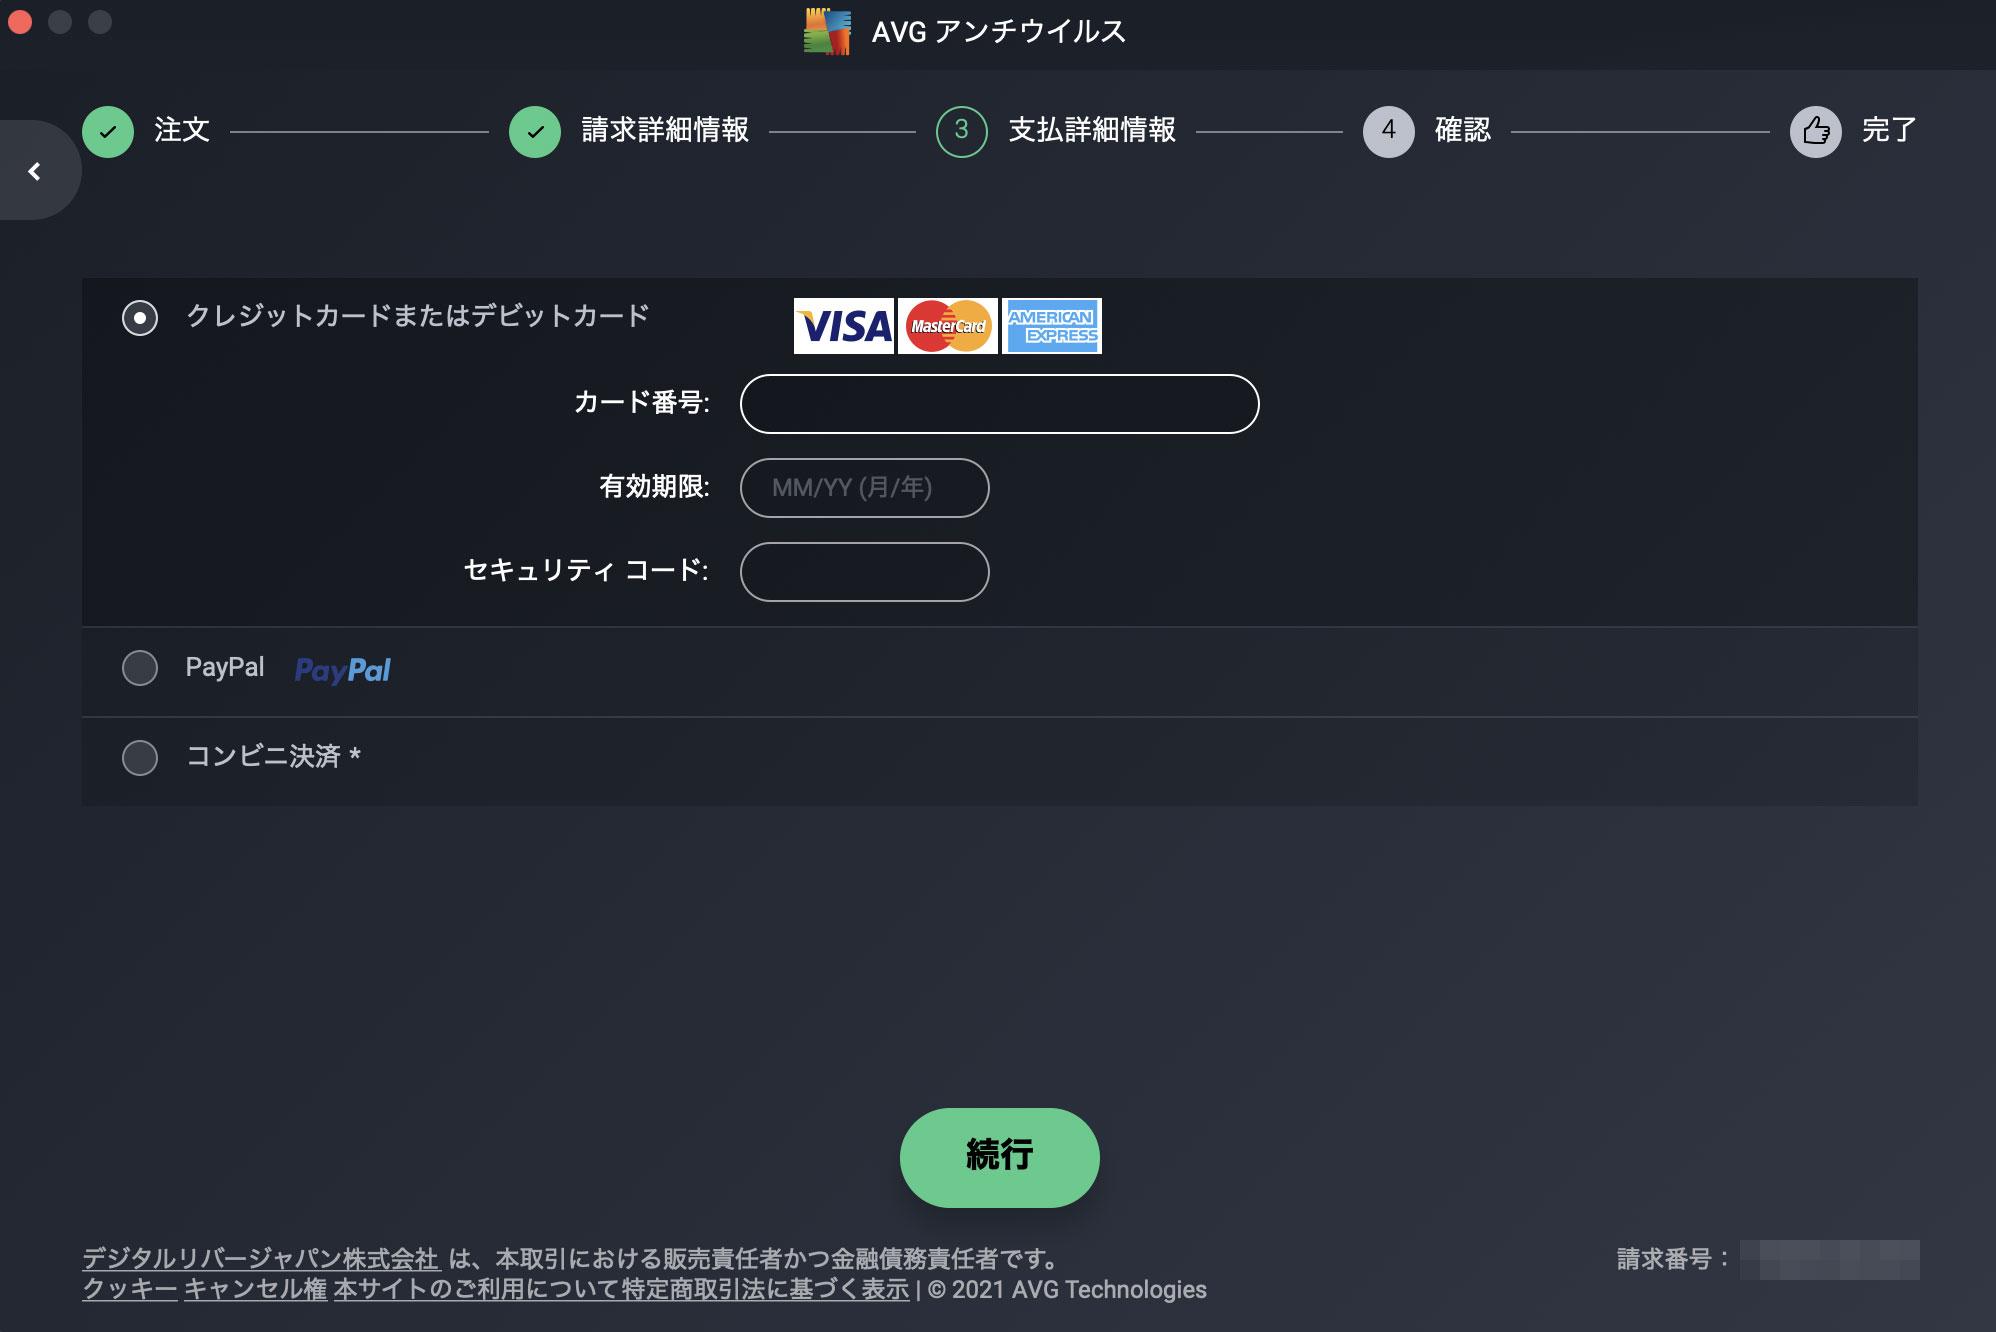 AVG-支払い方法選択と入力1-1